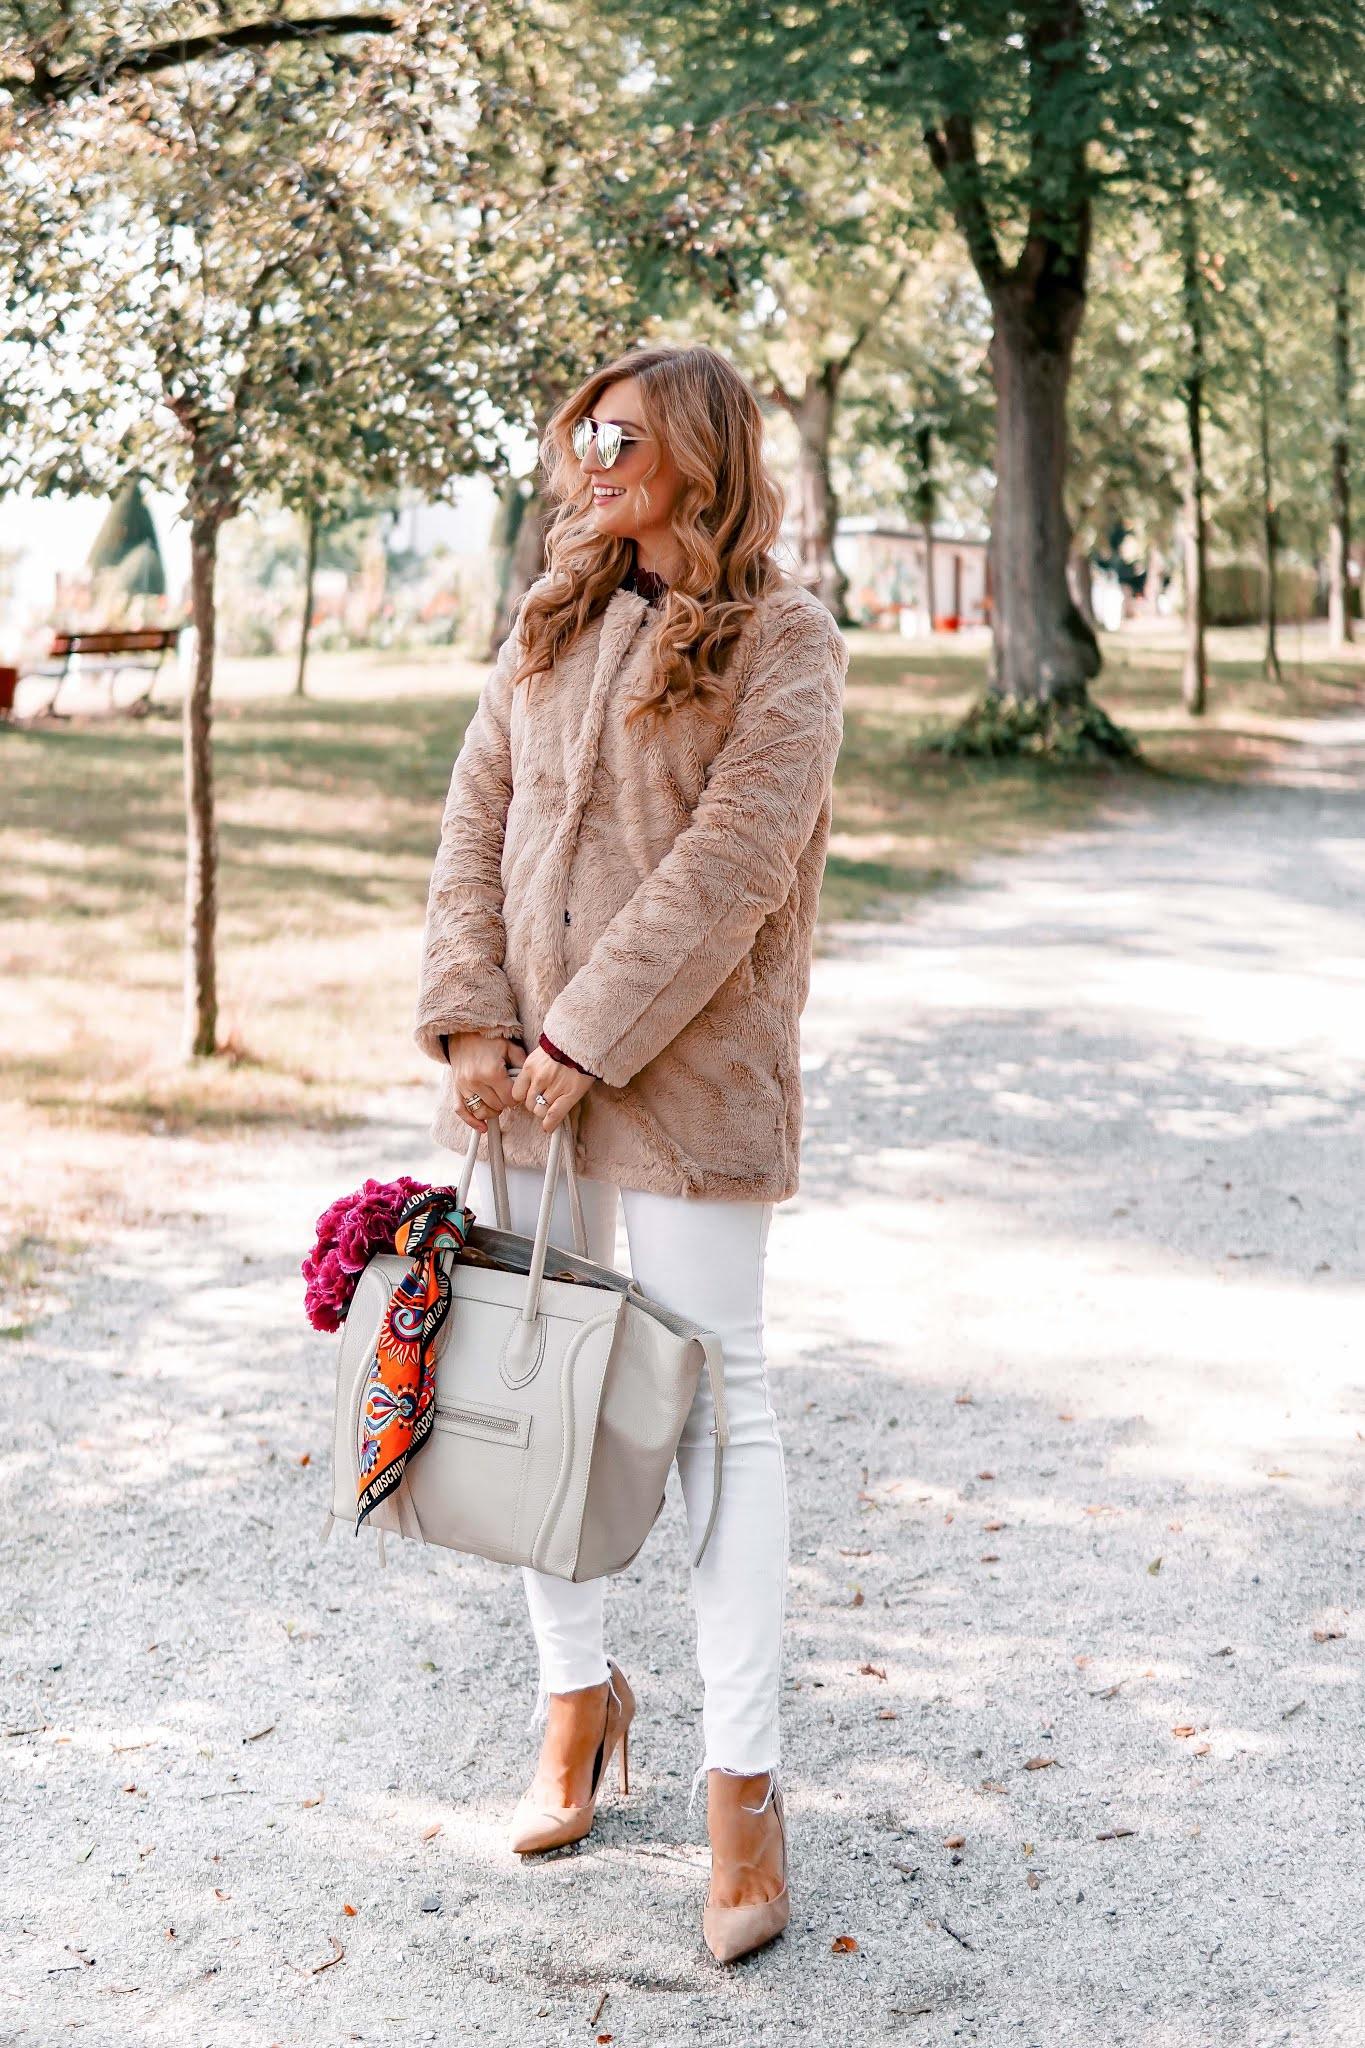 fashionstylebyjohanna Winter